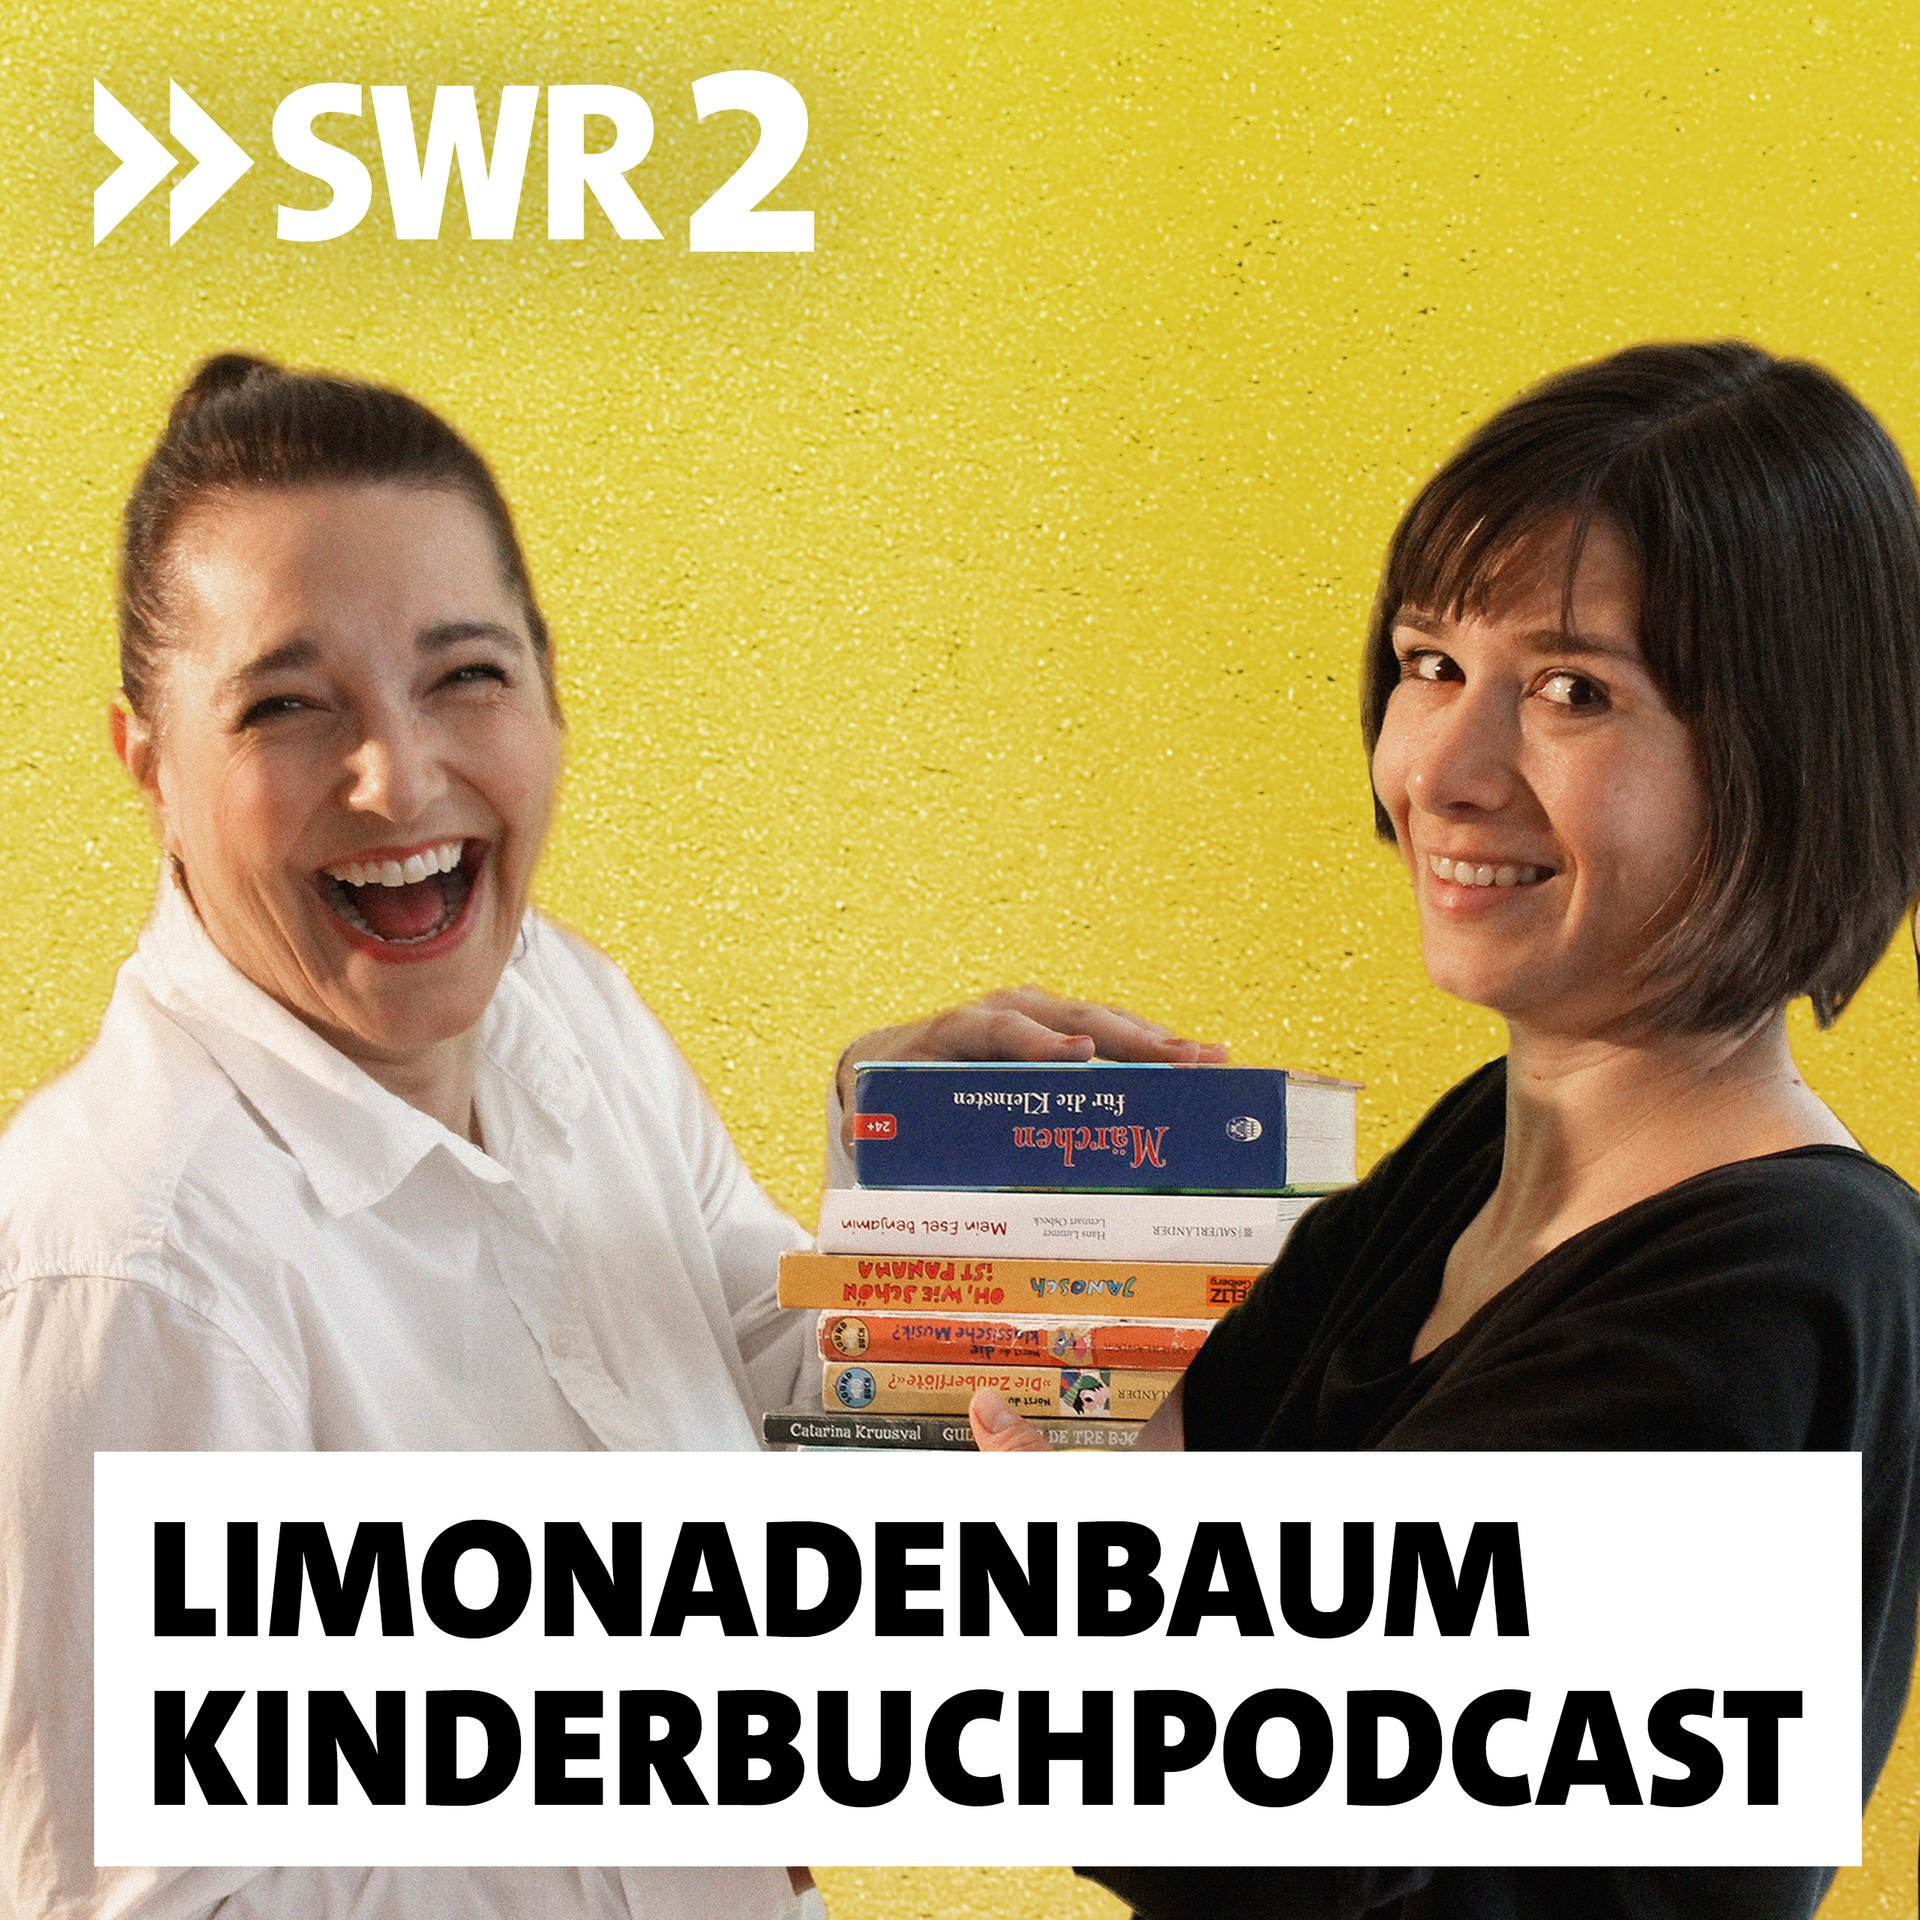 Podcast-Tipp: Limonadenbaum – Der Kinderbuch-Podcast